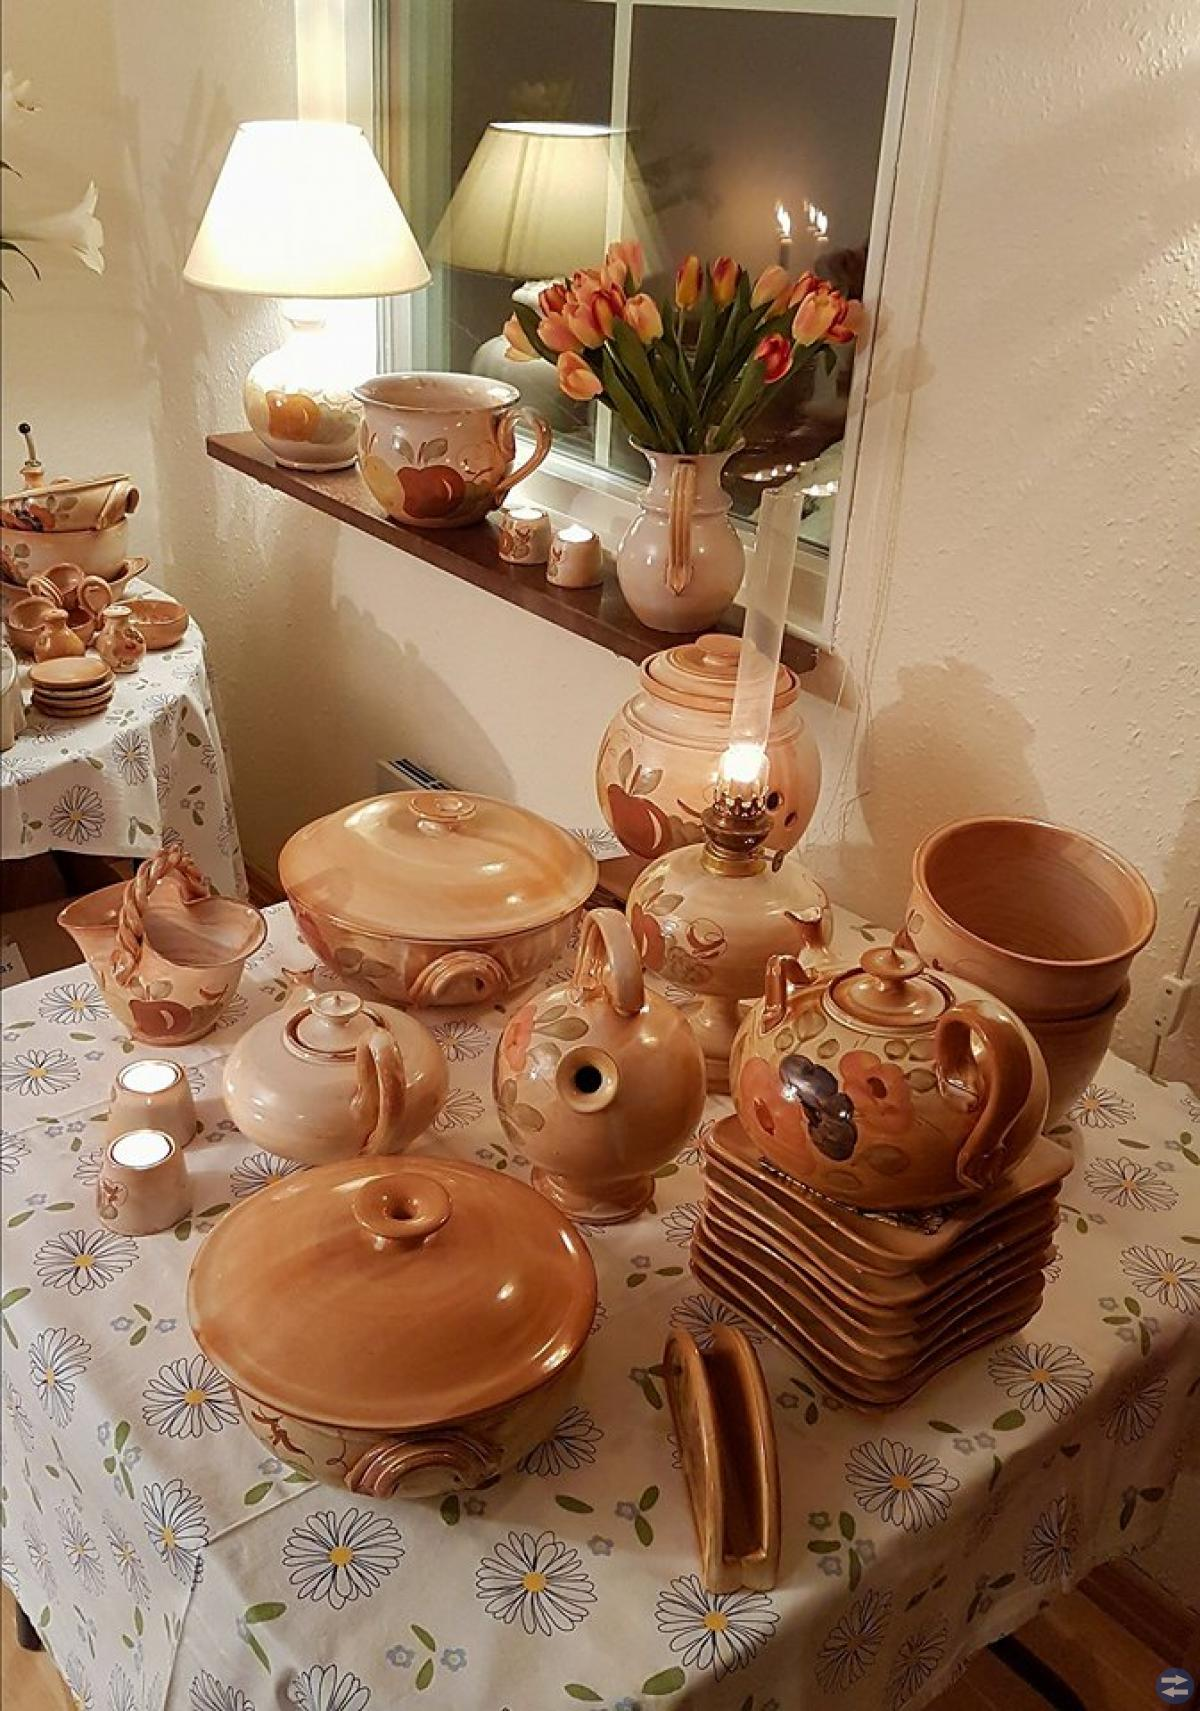 Mycket fin La Poterie keramik